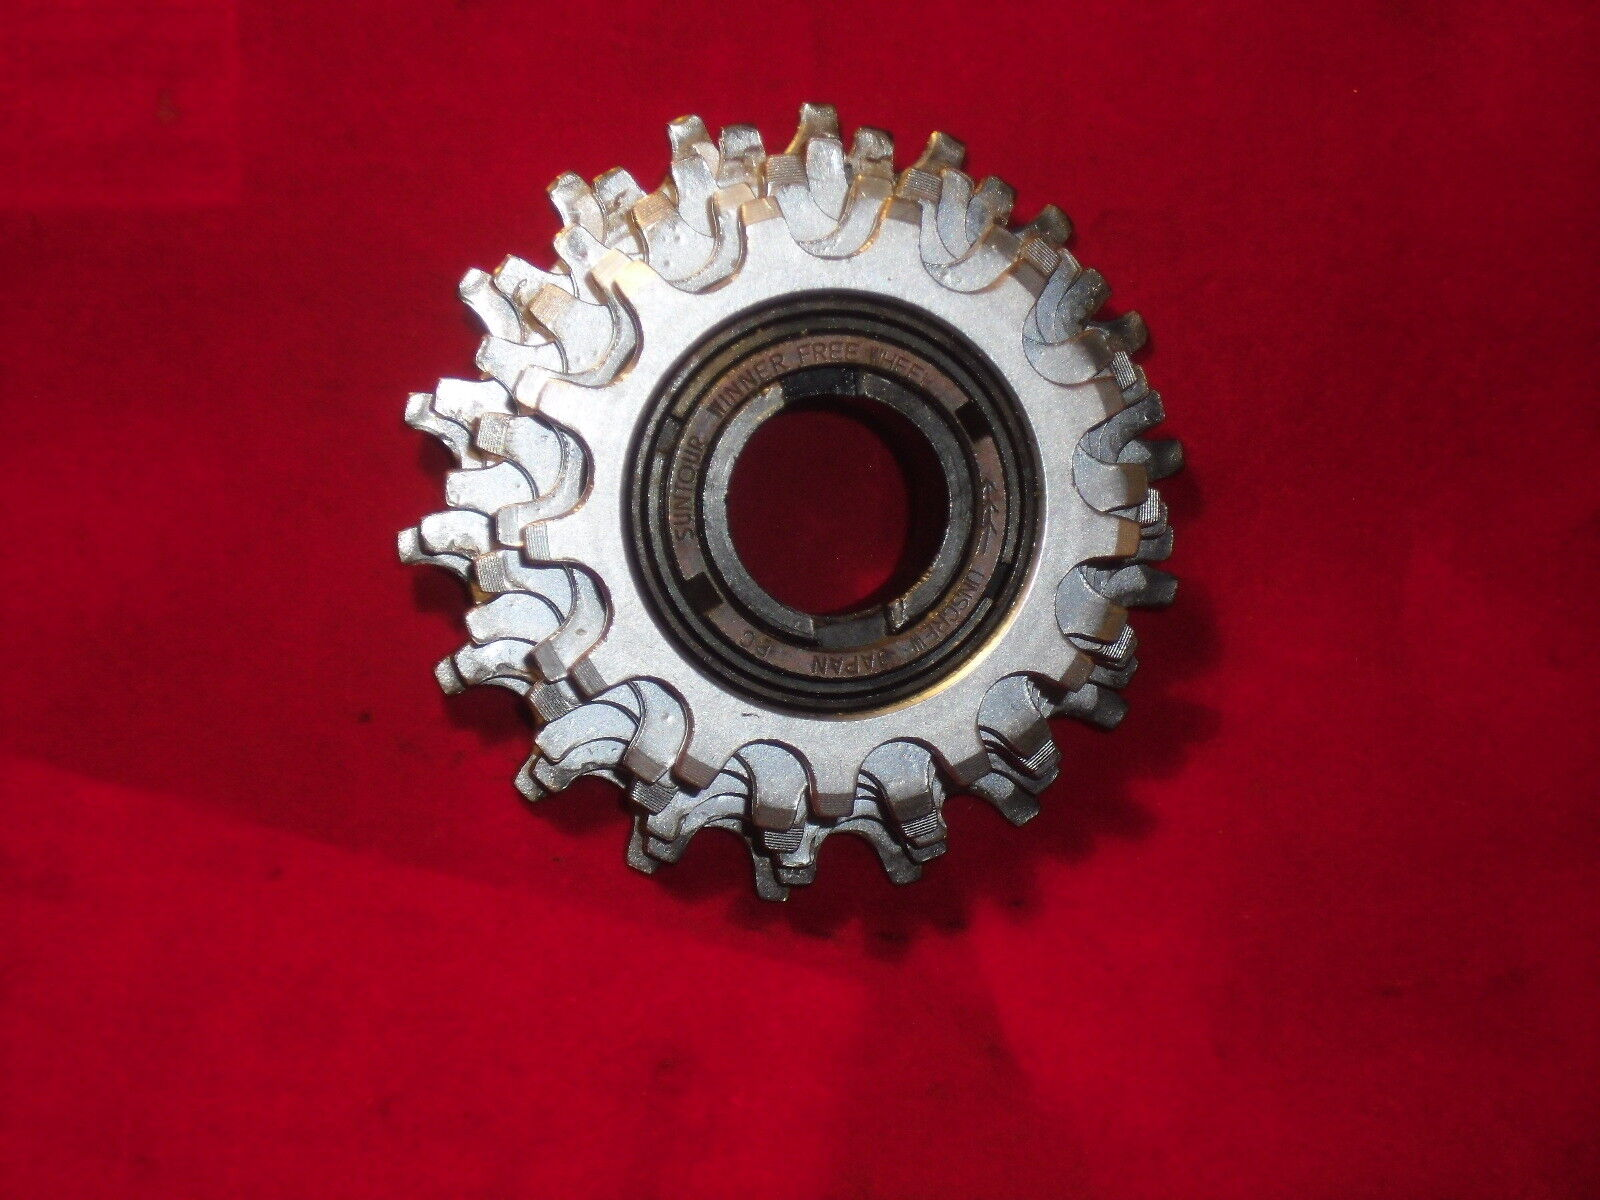 Vintage Suntour Freewheel  Cluster,6 Speed 13-18. Nice  in stock